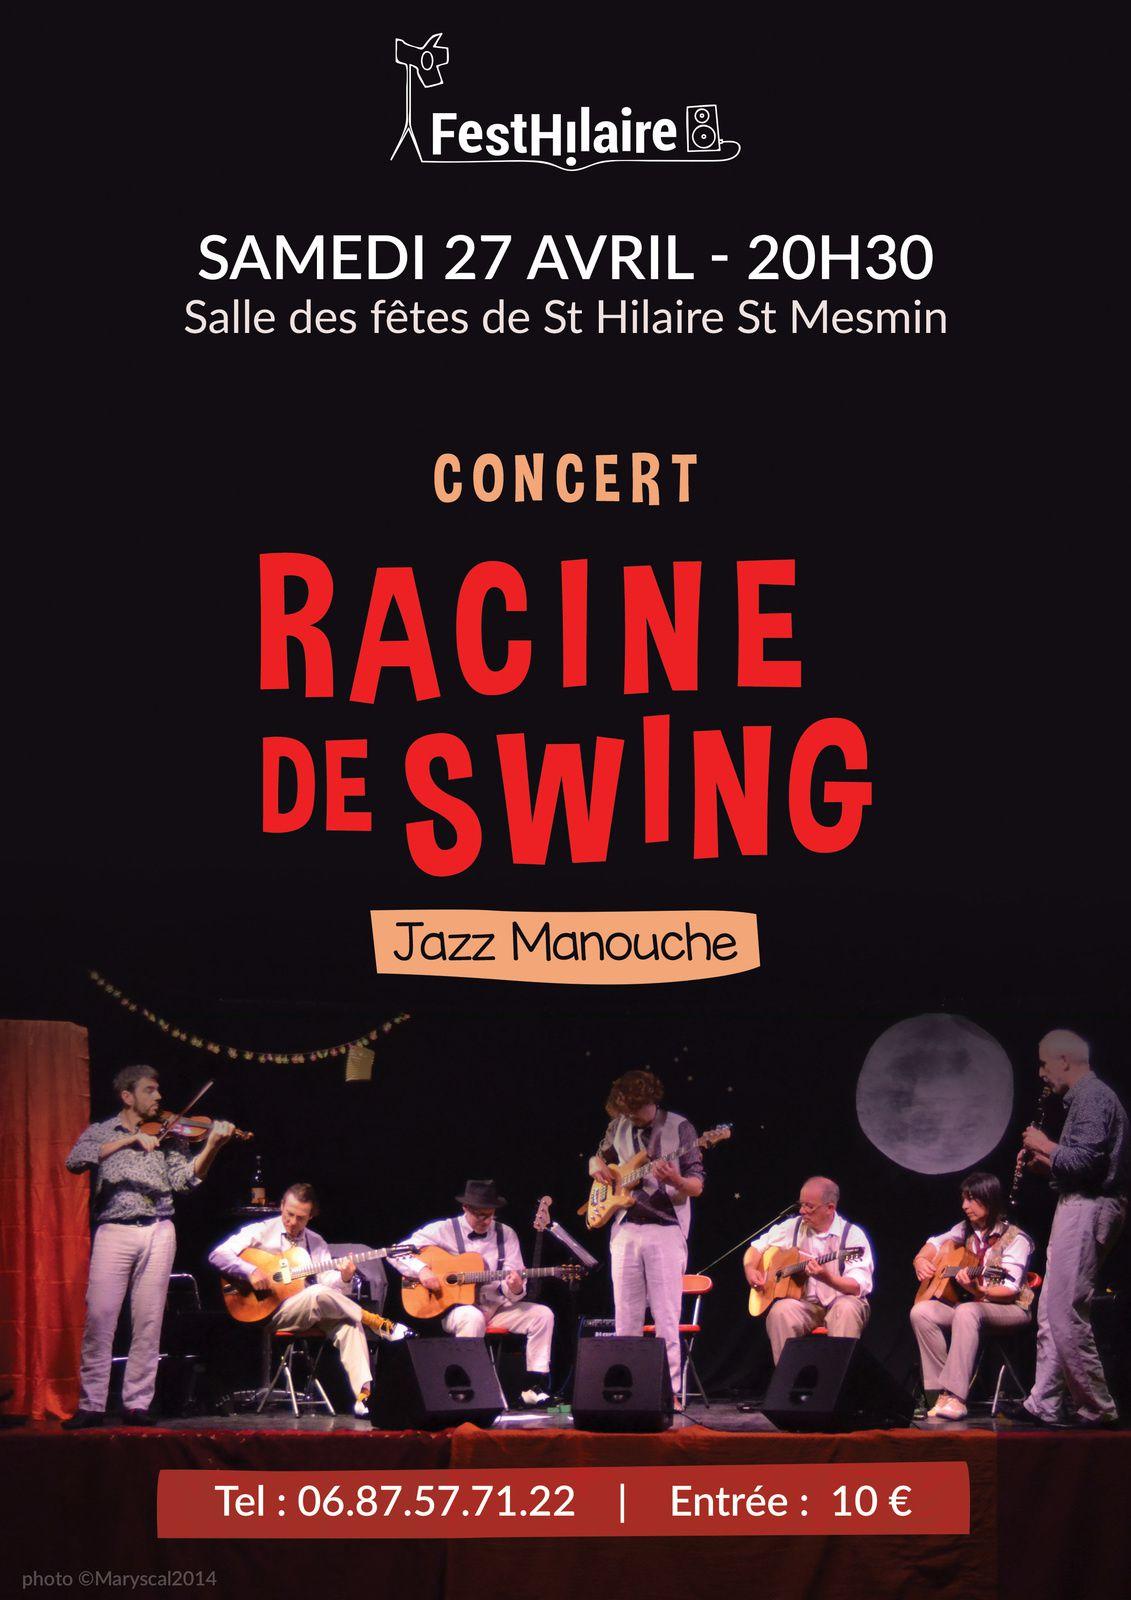 Racine de Swing en concert à St Hilaire St Mesmin